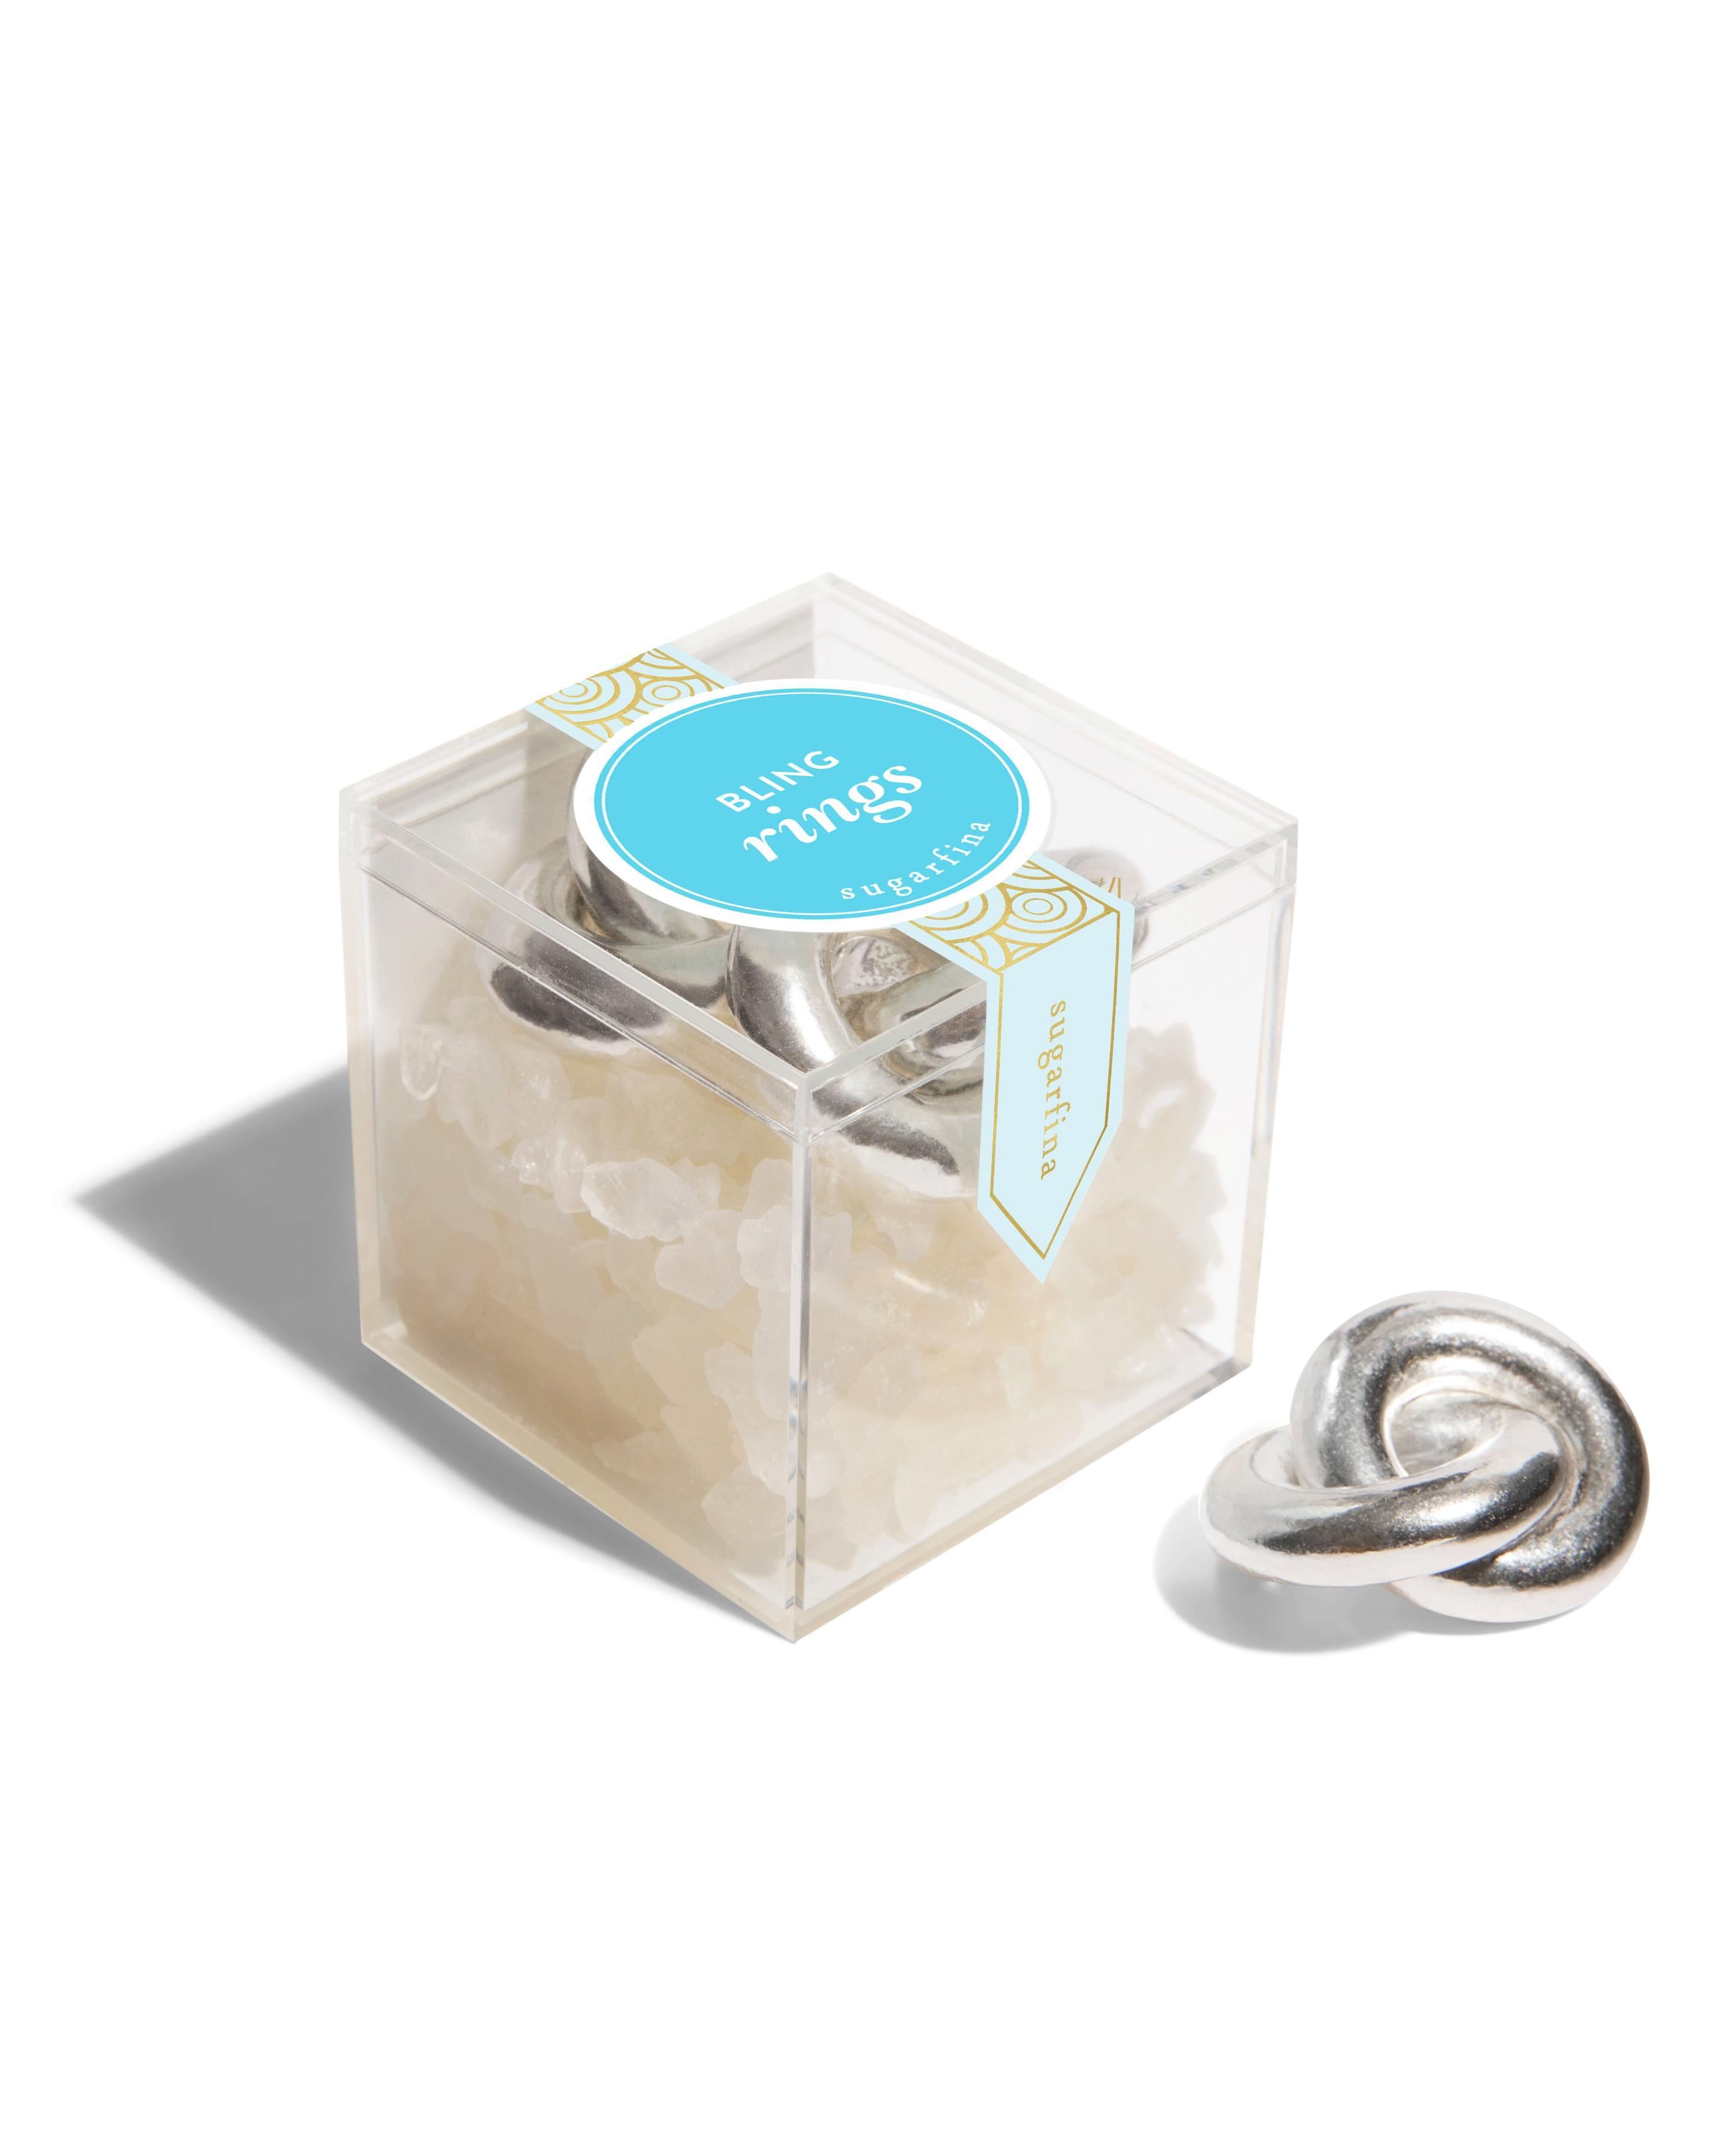 engagement gifts under 50 sugarfina